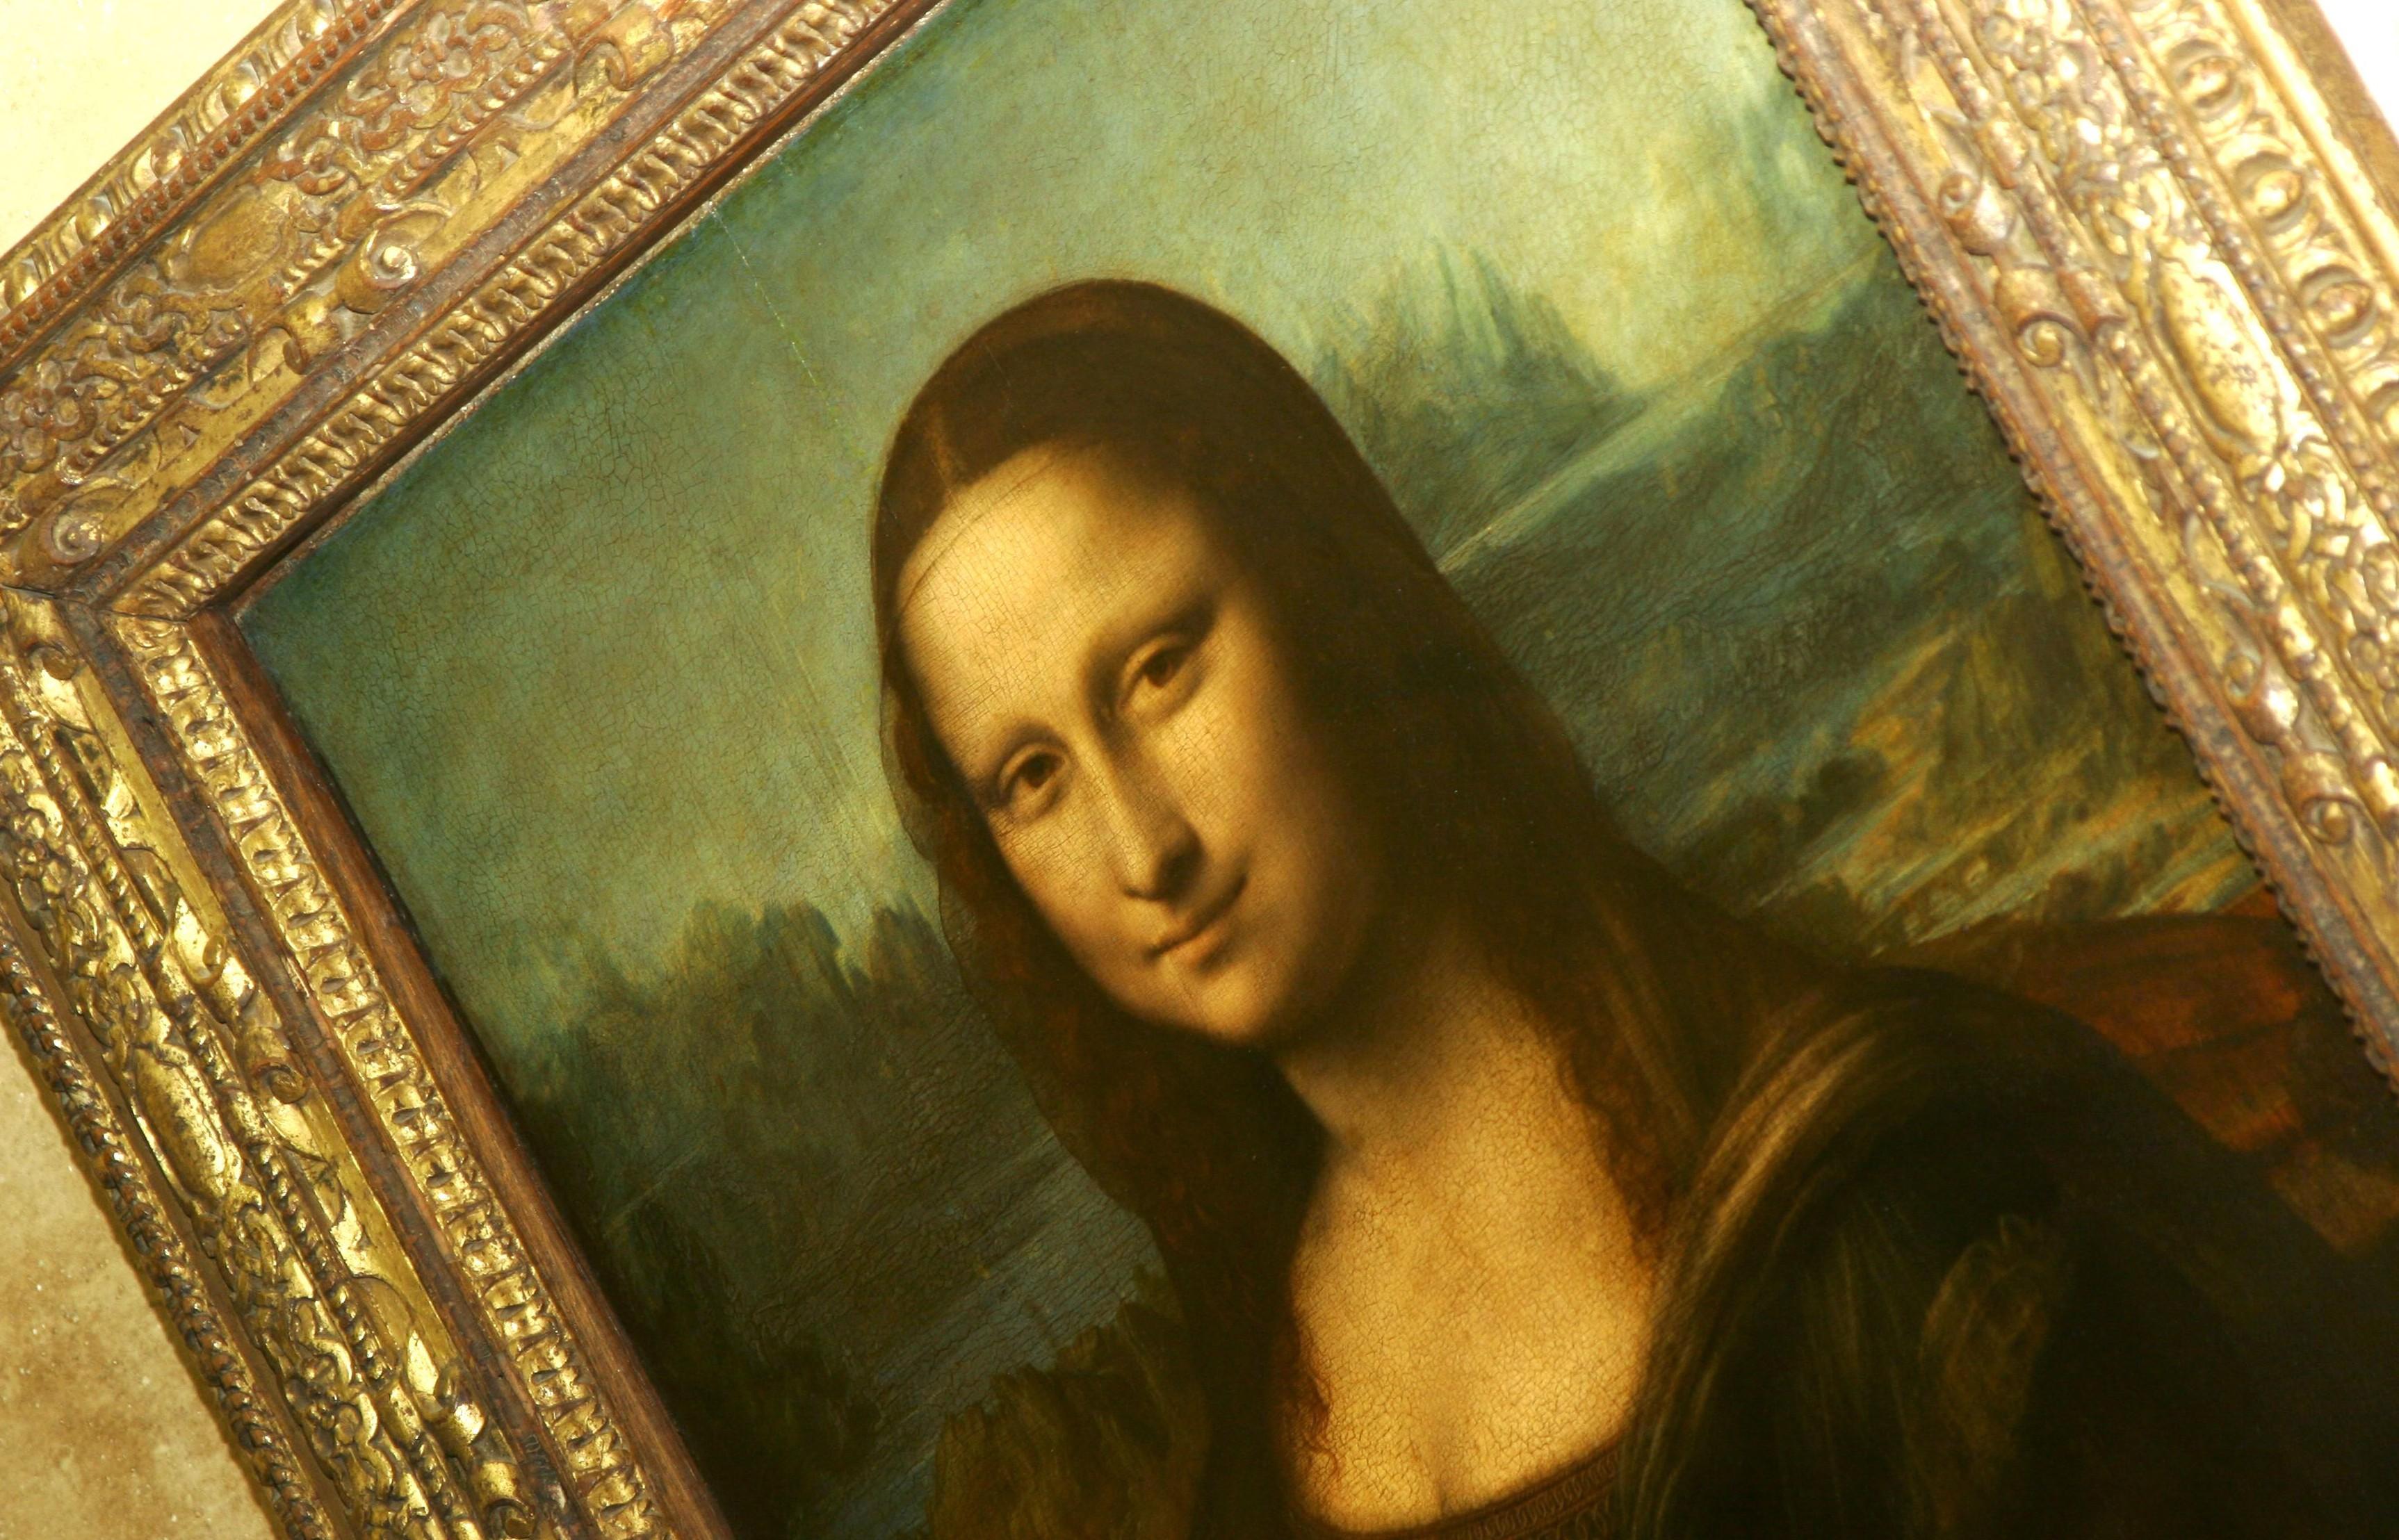 Mandatory Credit: Photo by Heloise Bergman/REX Shutterstock (2850846a) Louvre Mona Lisa Paris France Louvre Mona Lisa